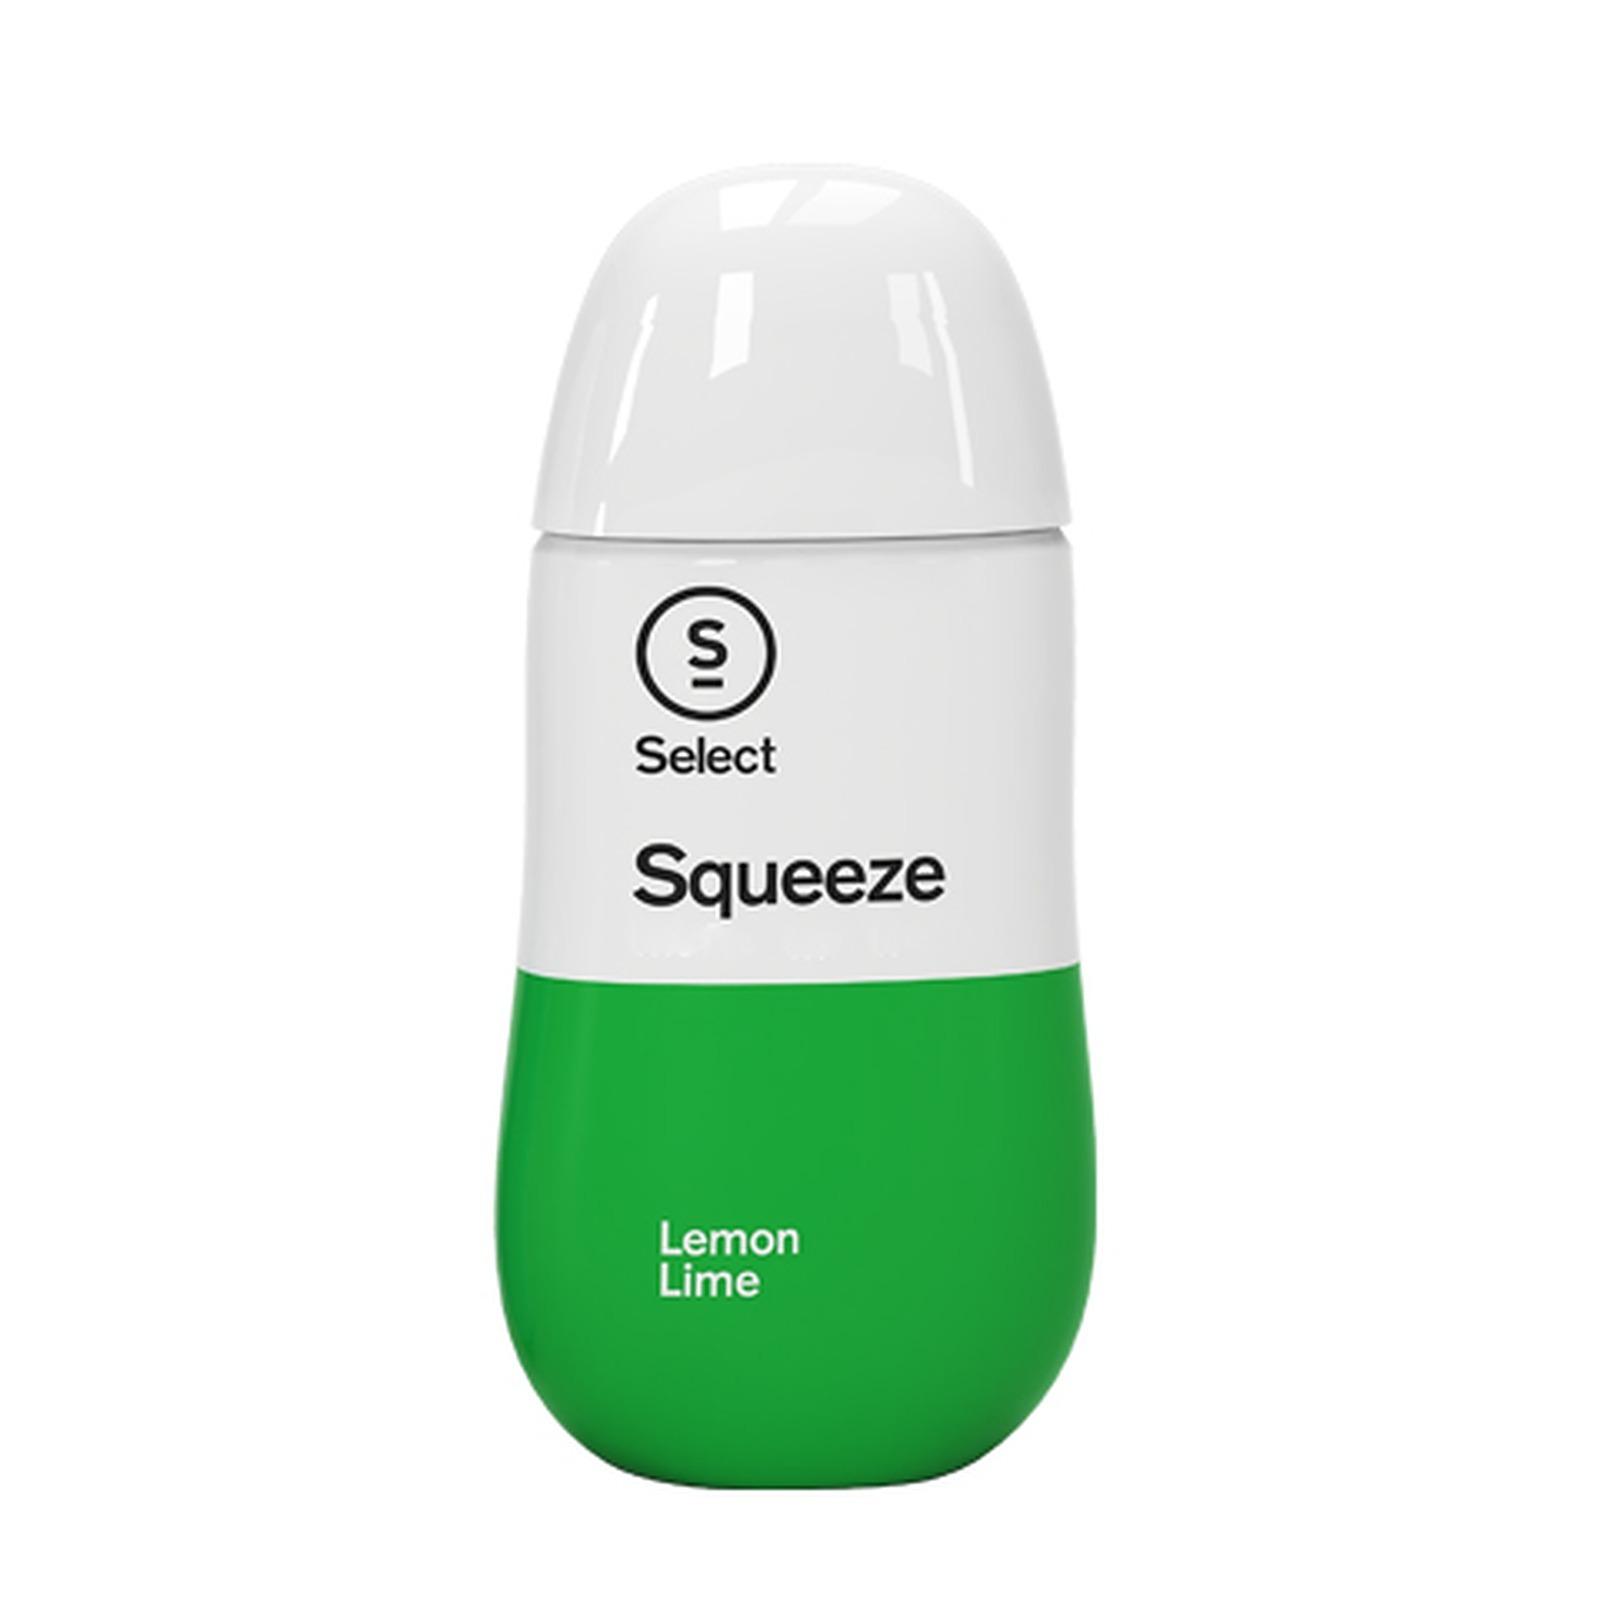 Select Squeeze 100mg Lemon-Lime – Sativa